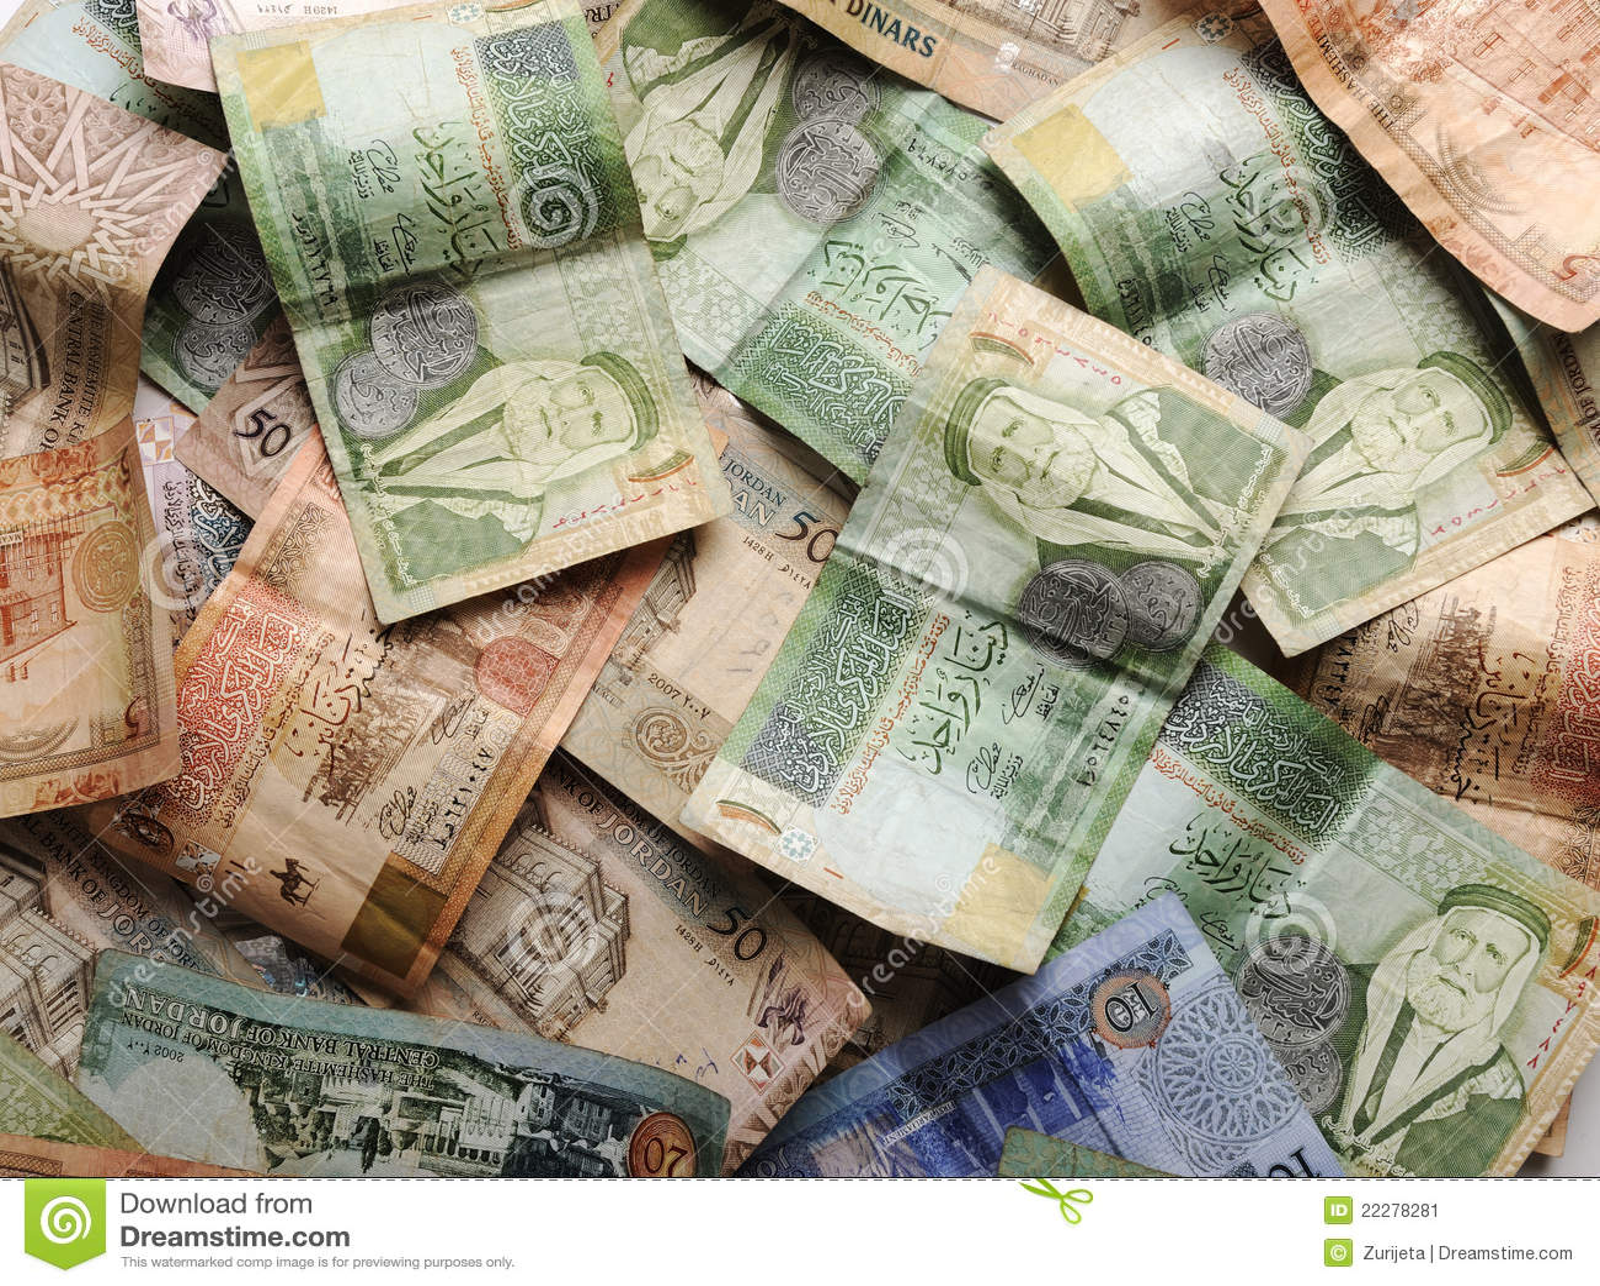 Арабские деньги фото 1993 год 100 рублей монета цена